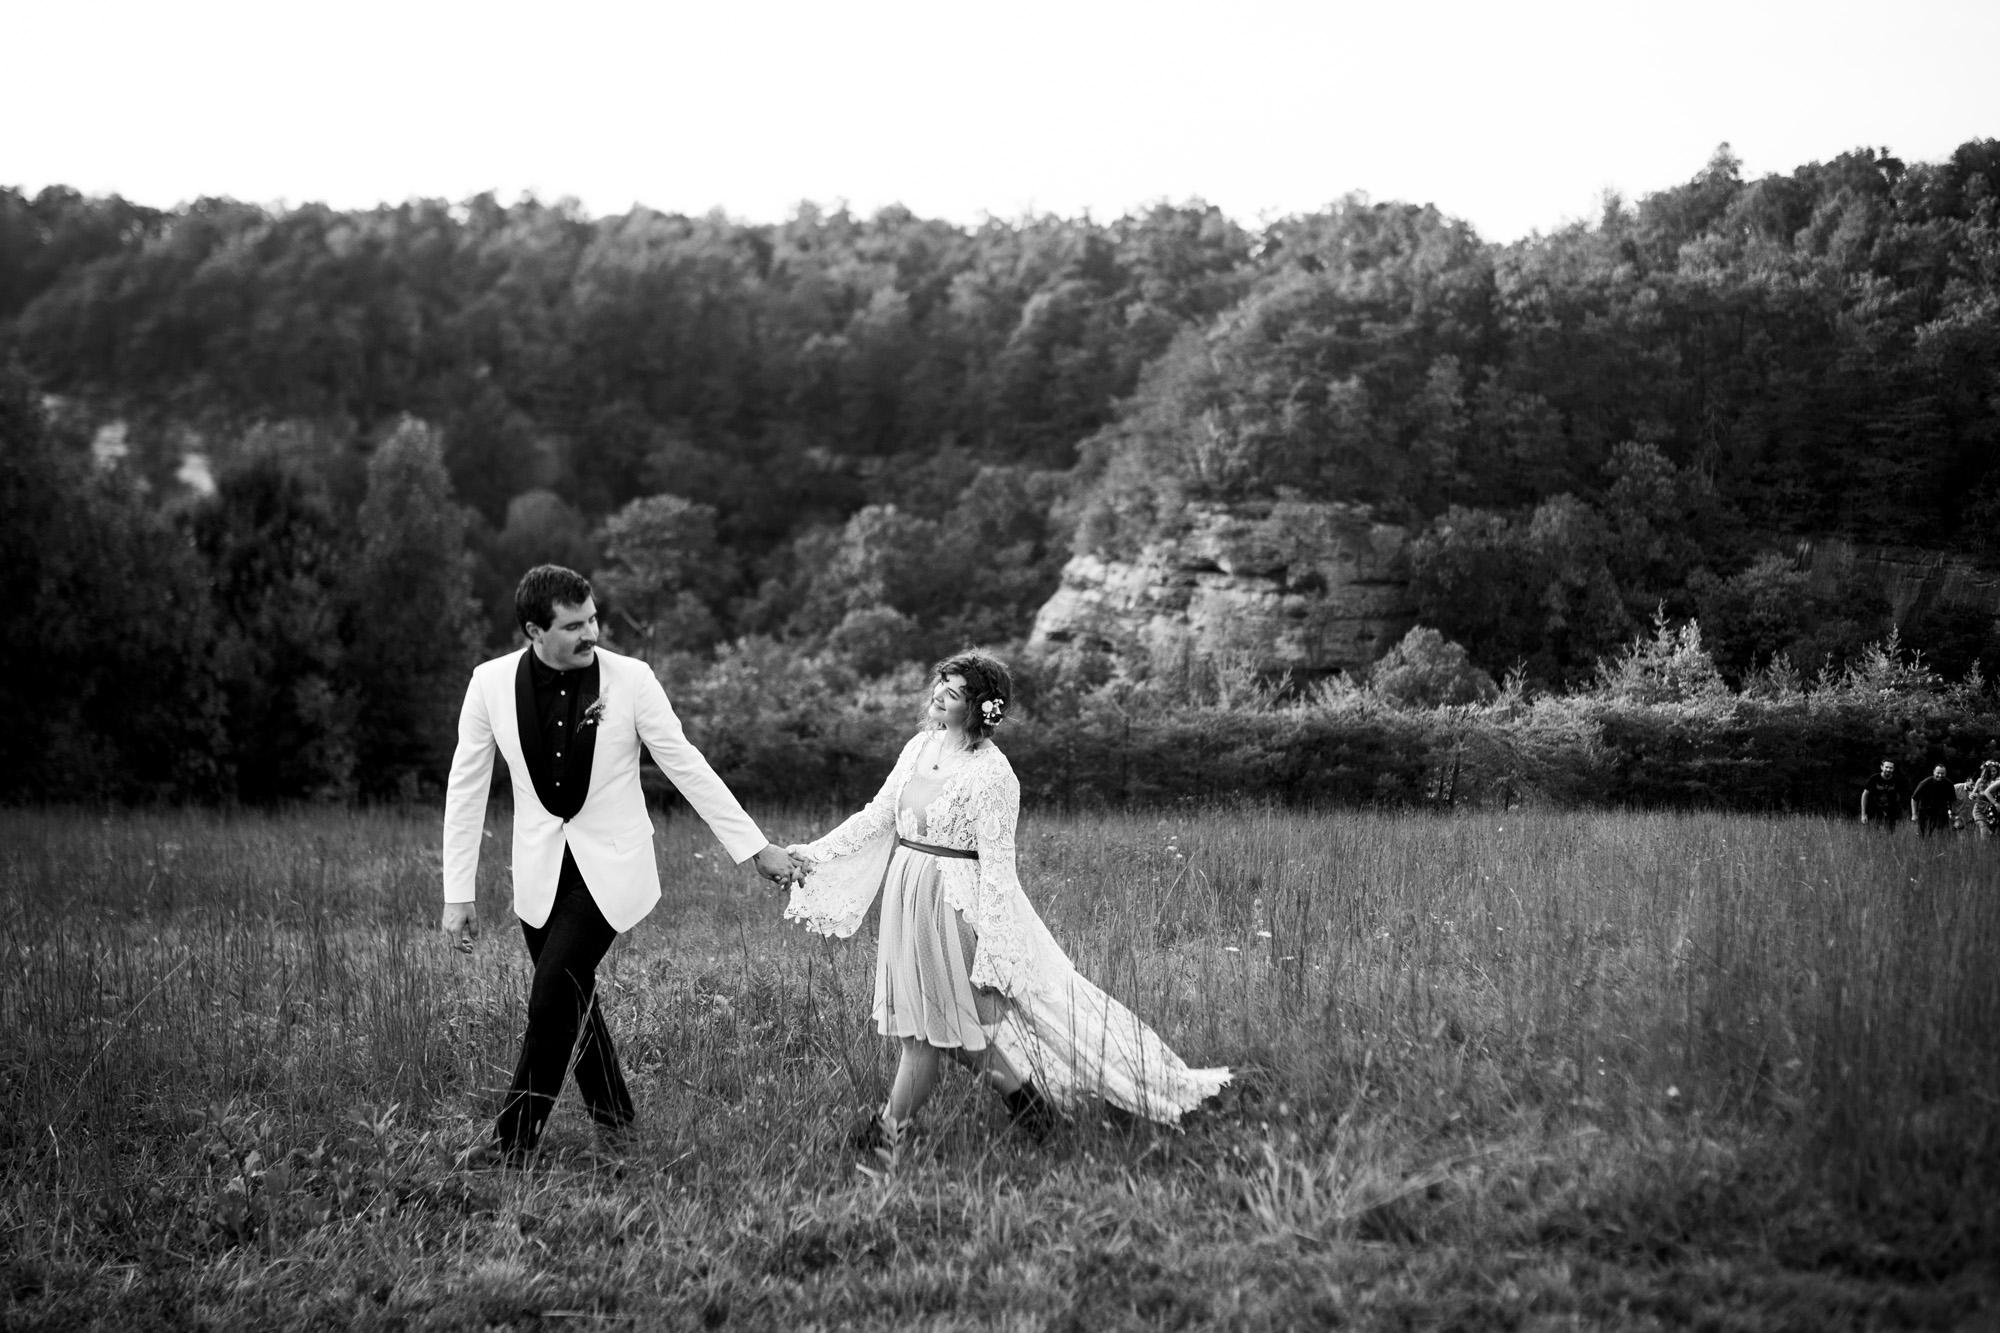 Seriously_Sabrina_Photography_Red_River_Gorge_Kentucky_Wedding_ShawnDana150.jpg